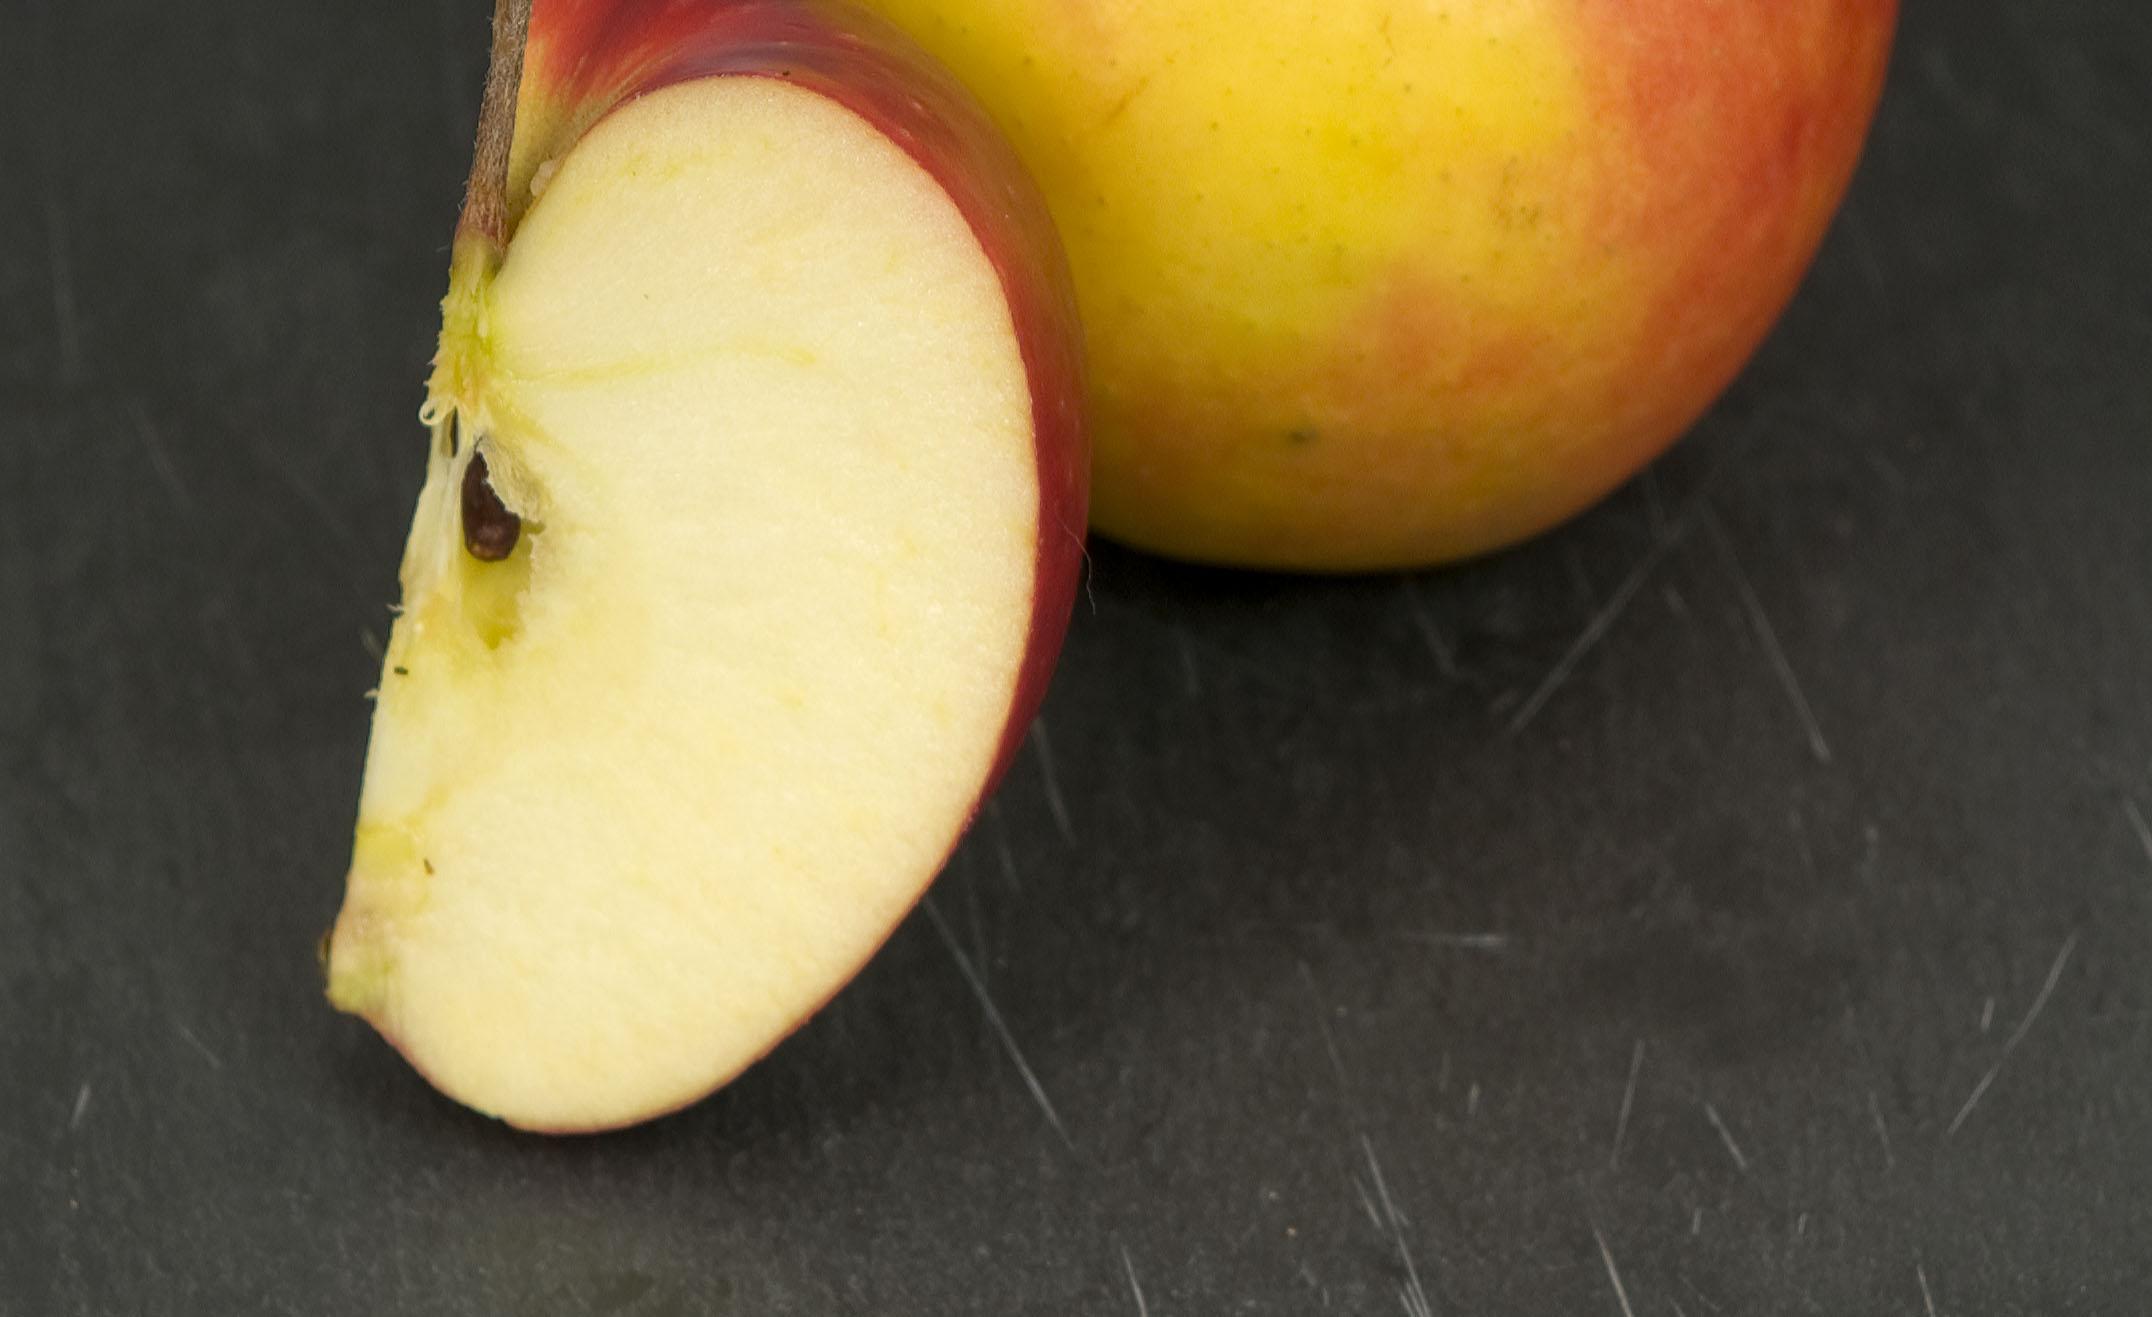 Arôme de pomme dans le vin - Tastavin guide du vin en ligne